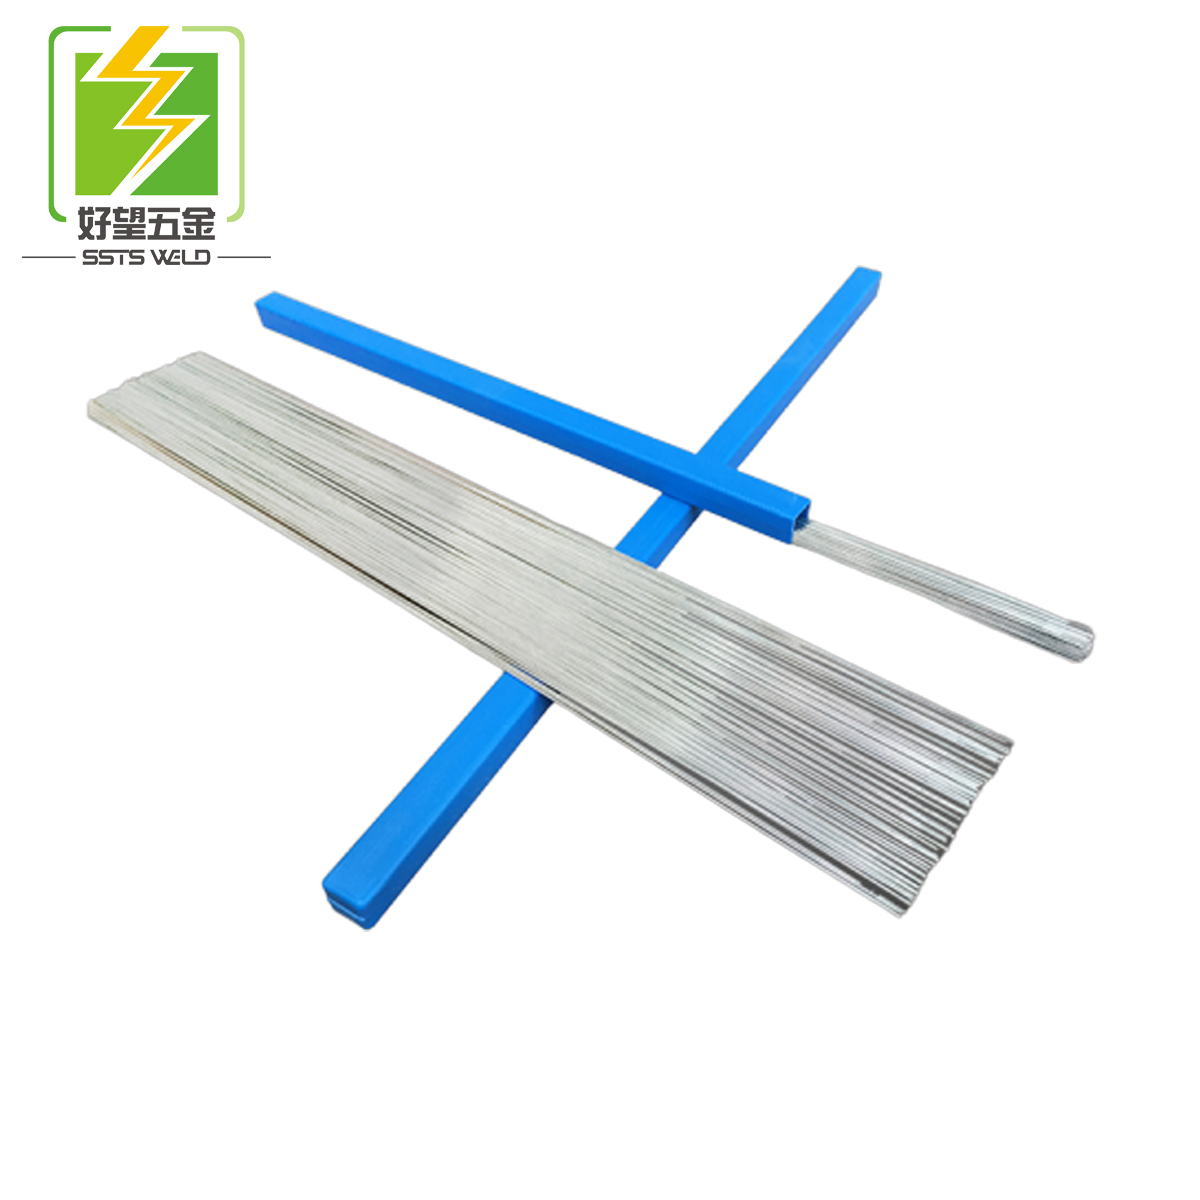 High quality popular Aluminum/Aluminum Alloy Material TIG welding rod ER5356